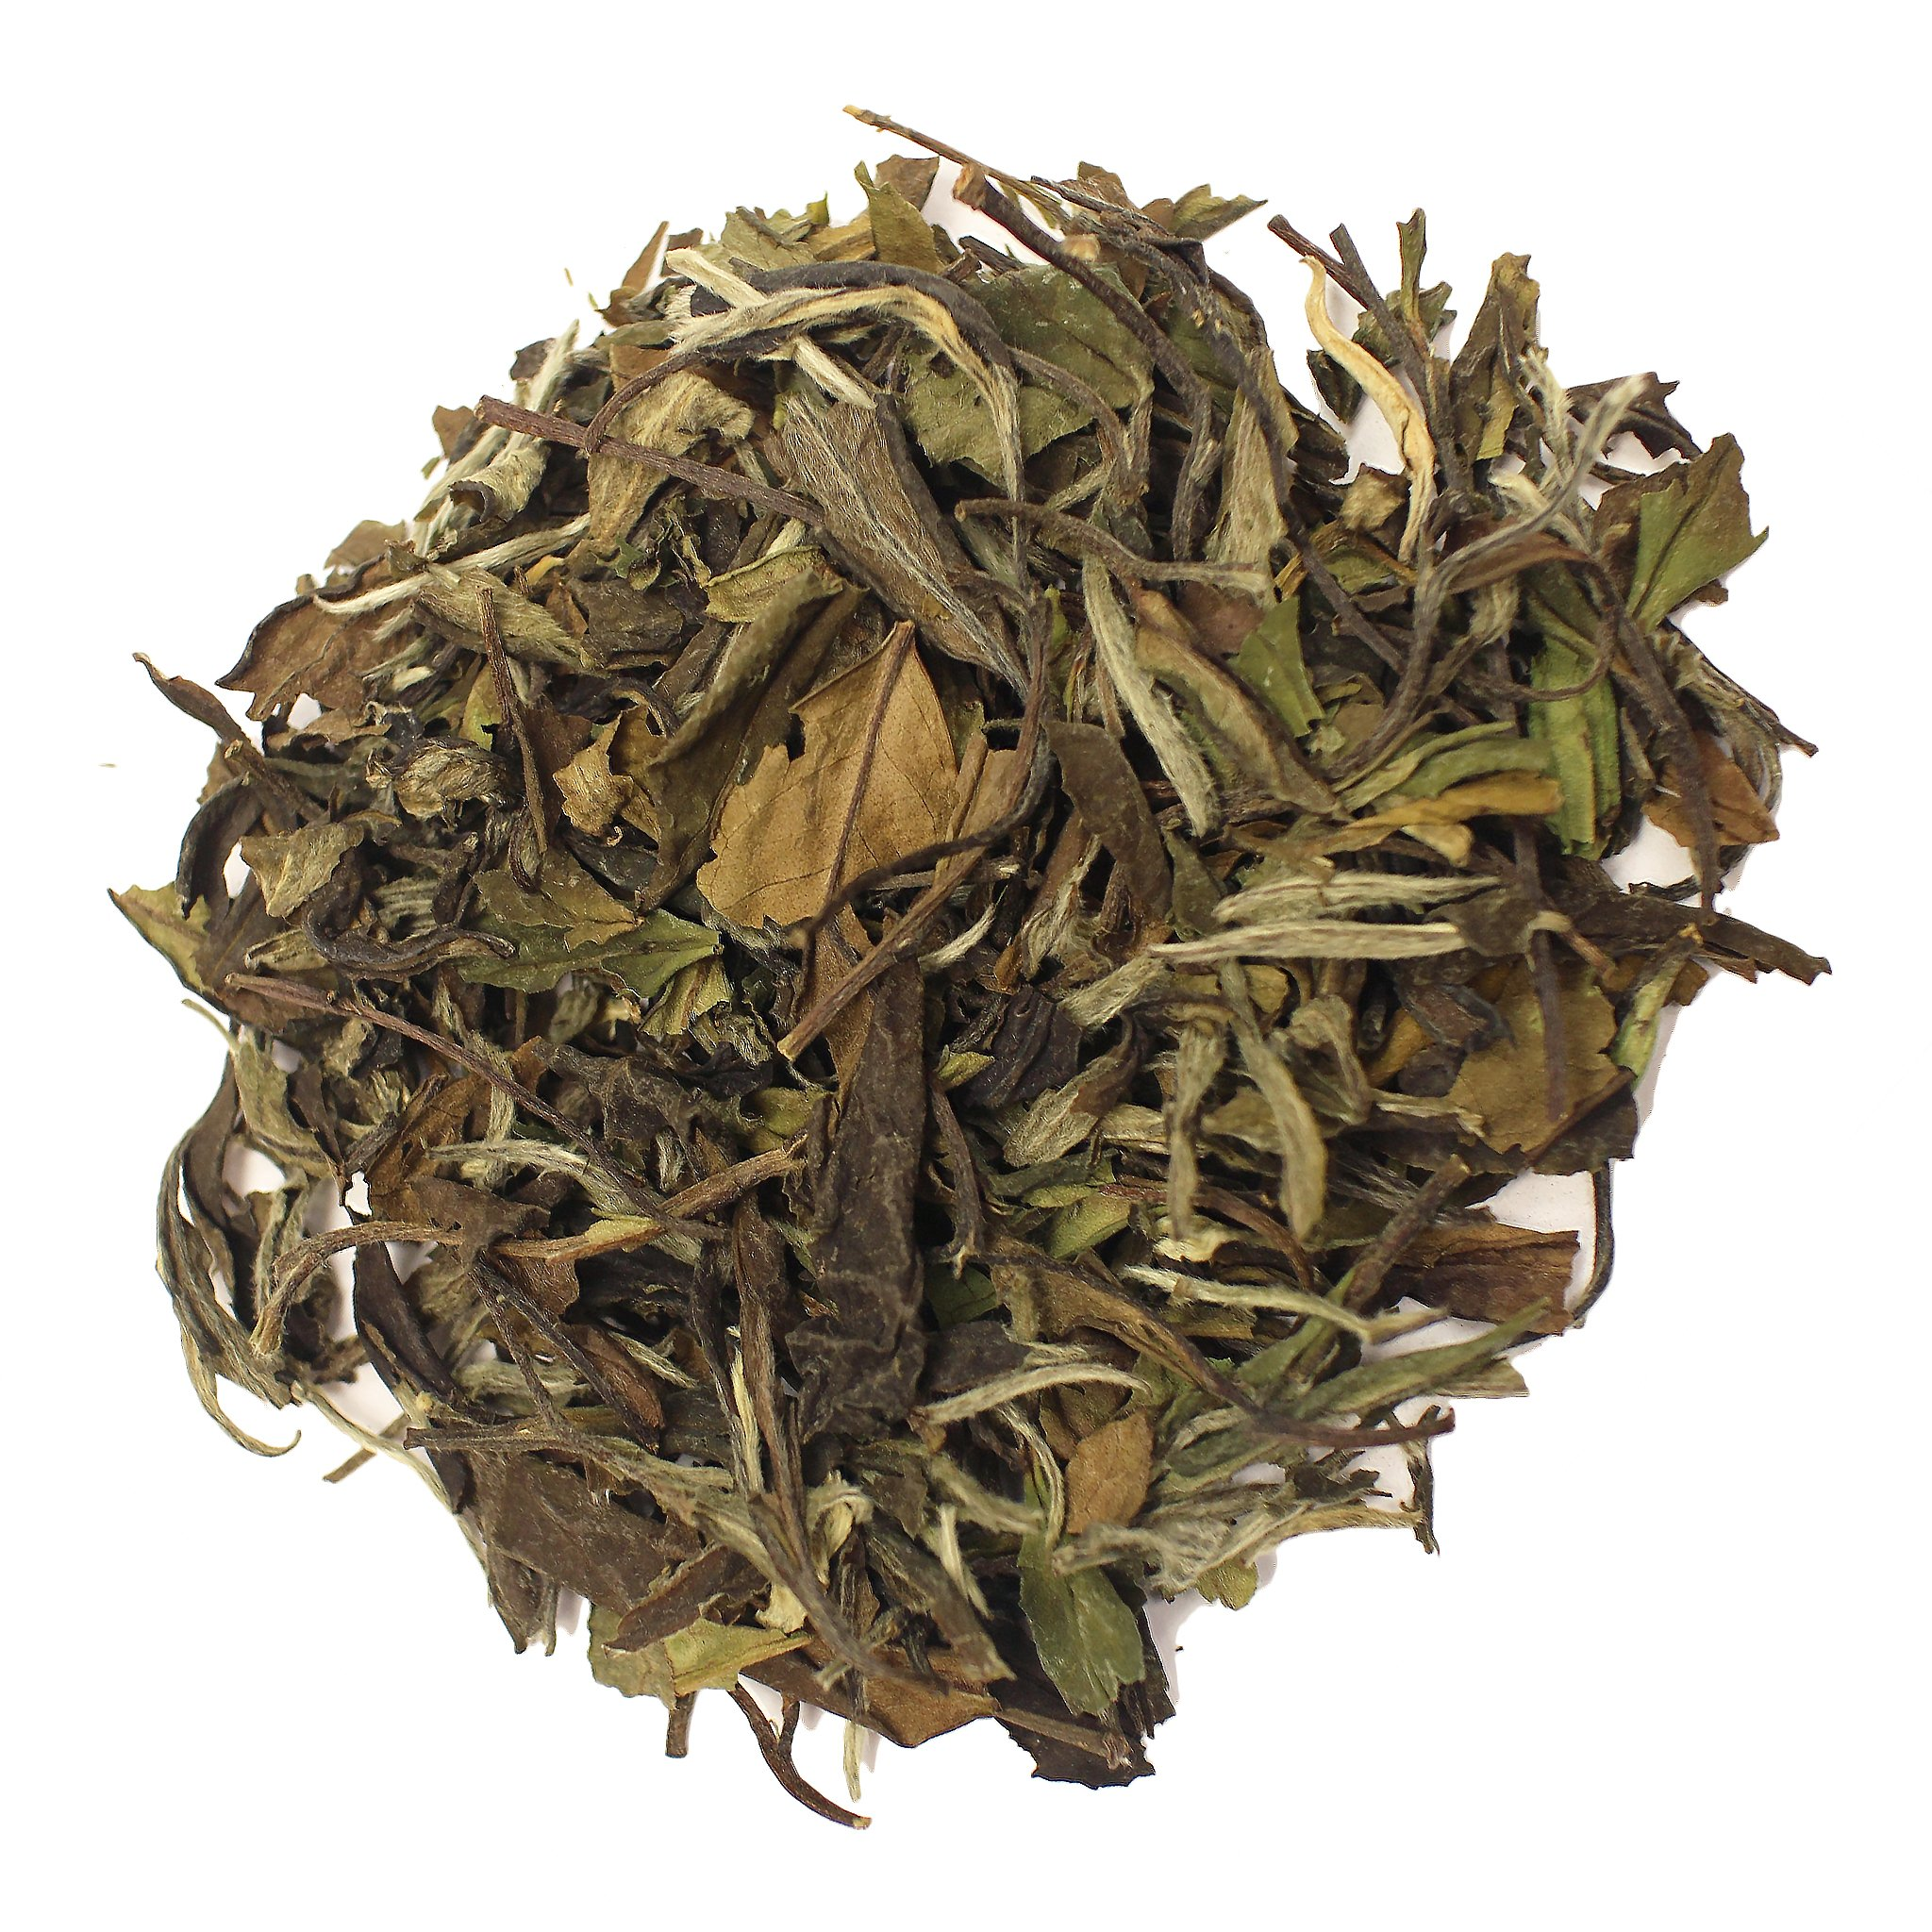 The Tea Farm - Shou Mei White Tea - Chinese Loose Leaf White Tea (16 Ounce Bag) by The Tea Farm